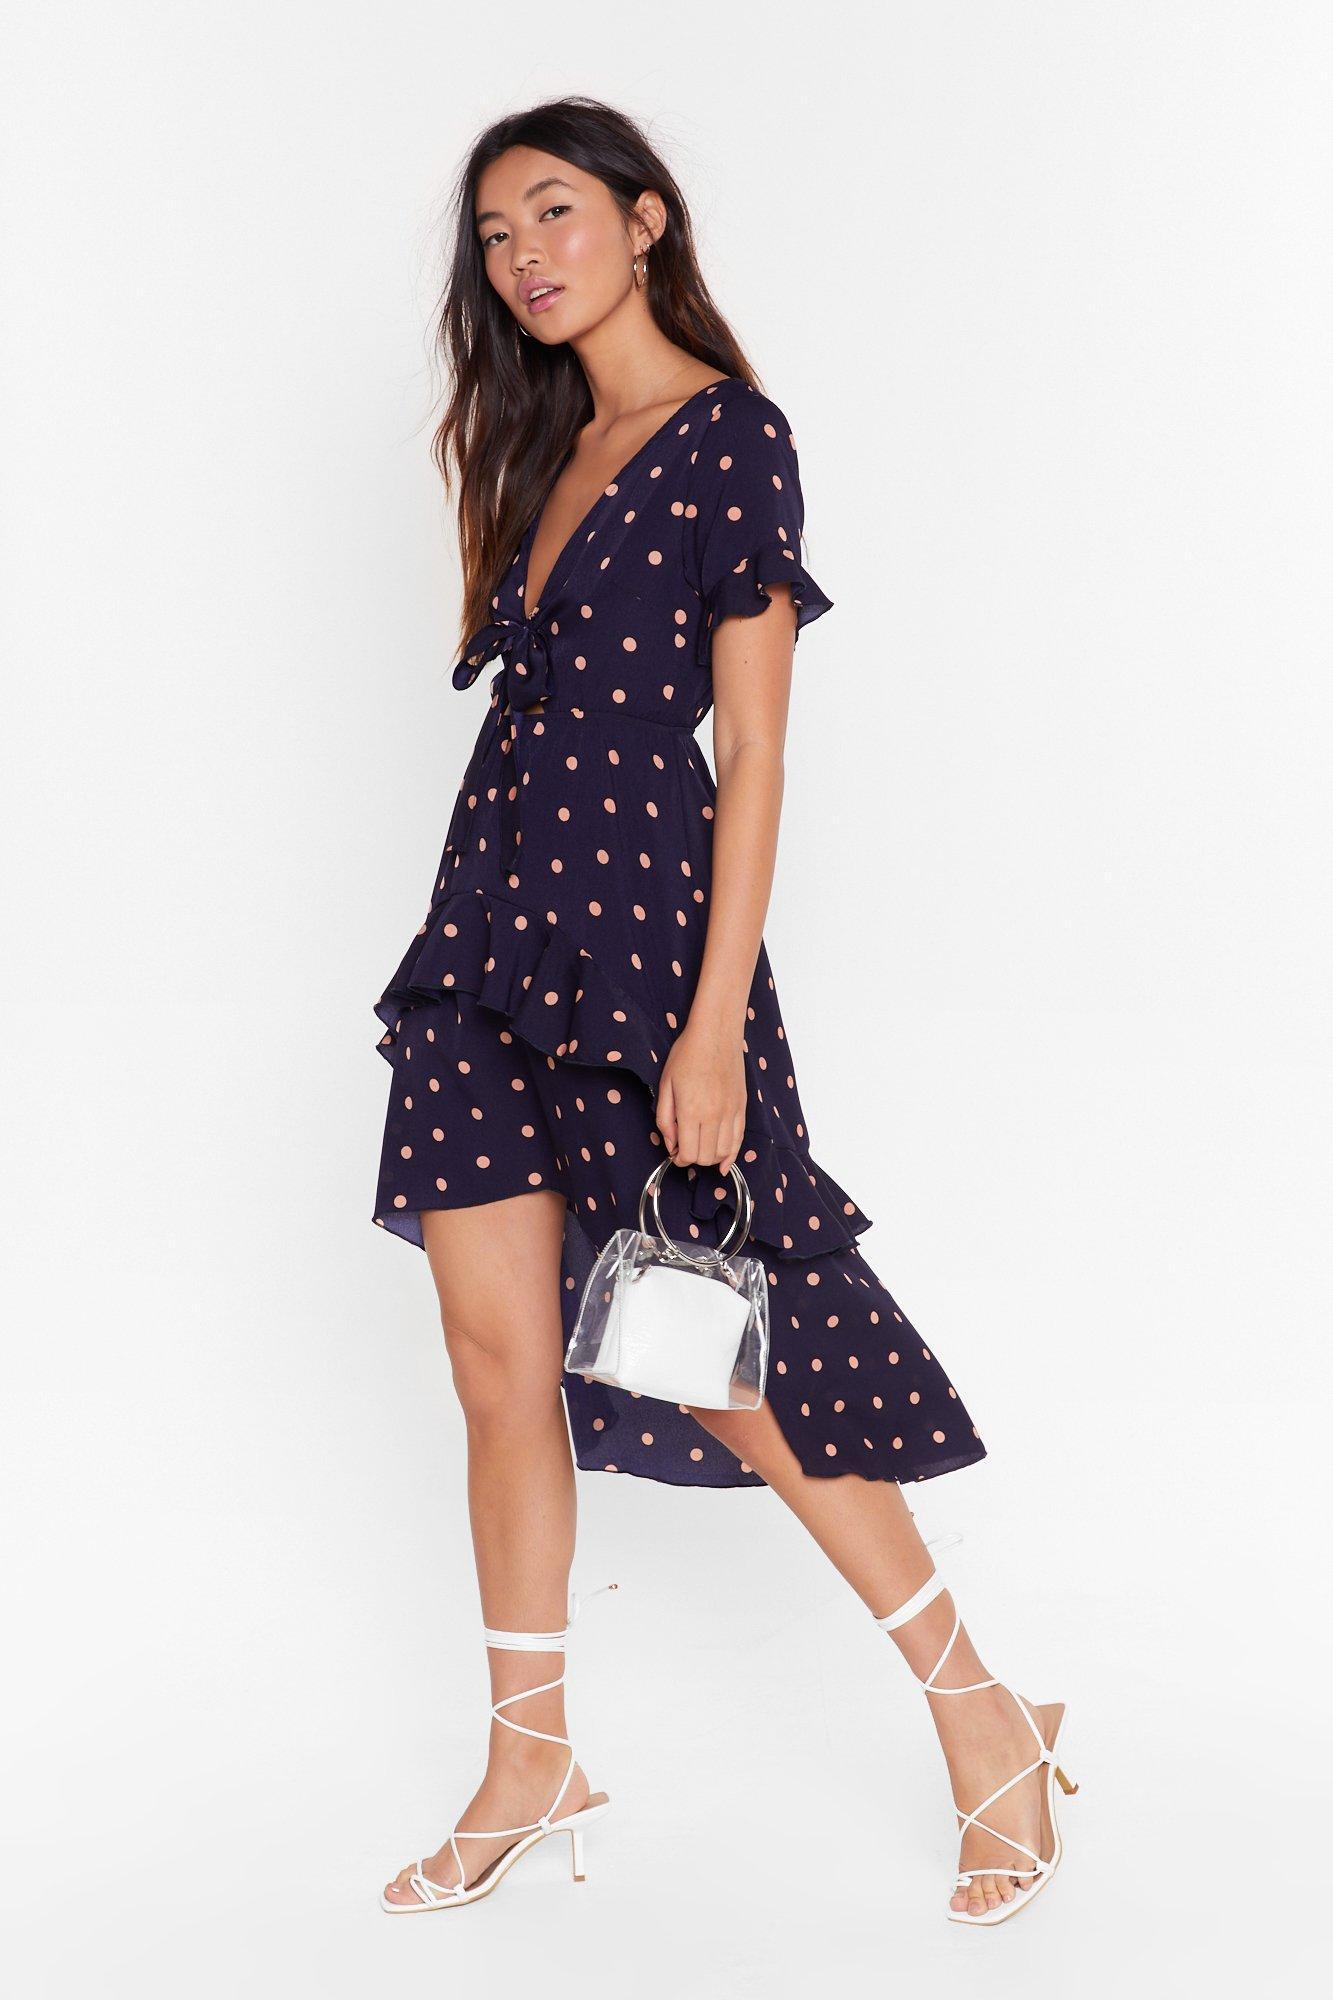 Image of Tie-ing to Find a Balance Polka Dot Midi Dress